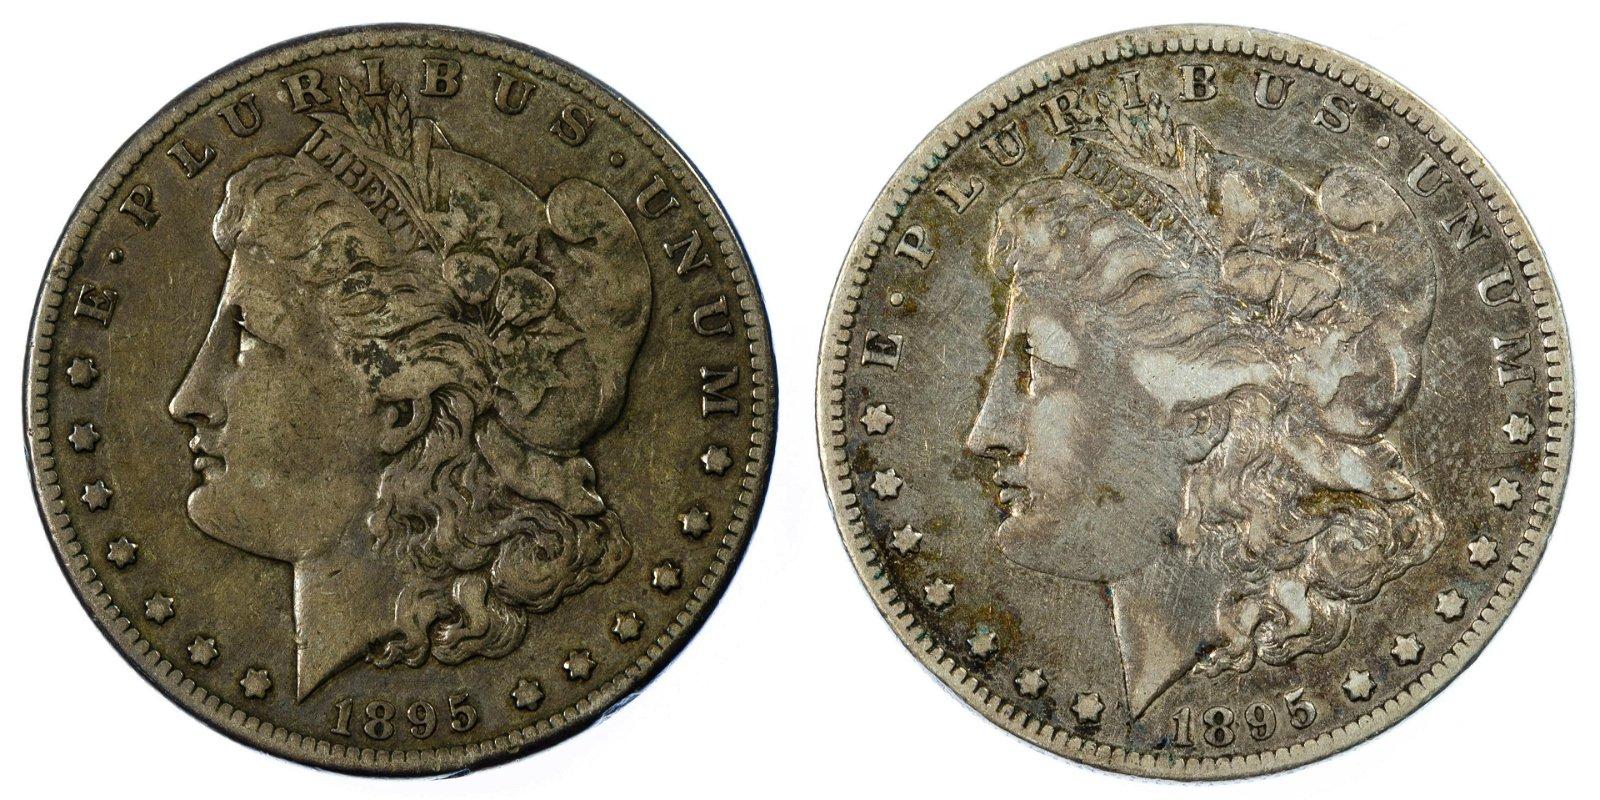 1895-O, 1895-S $1 F/VF